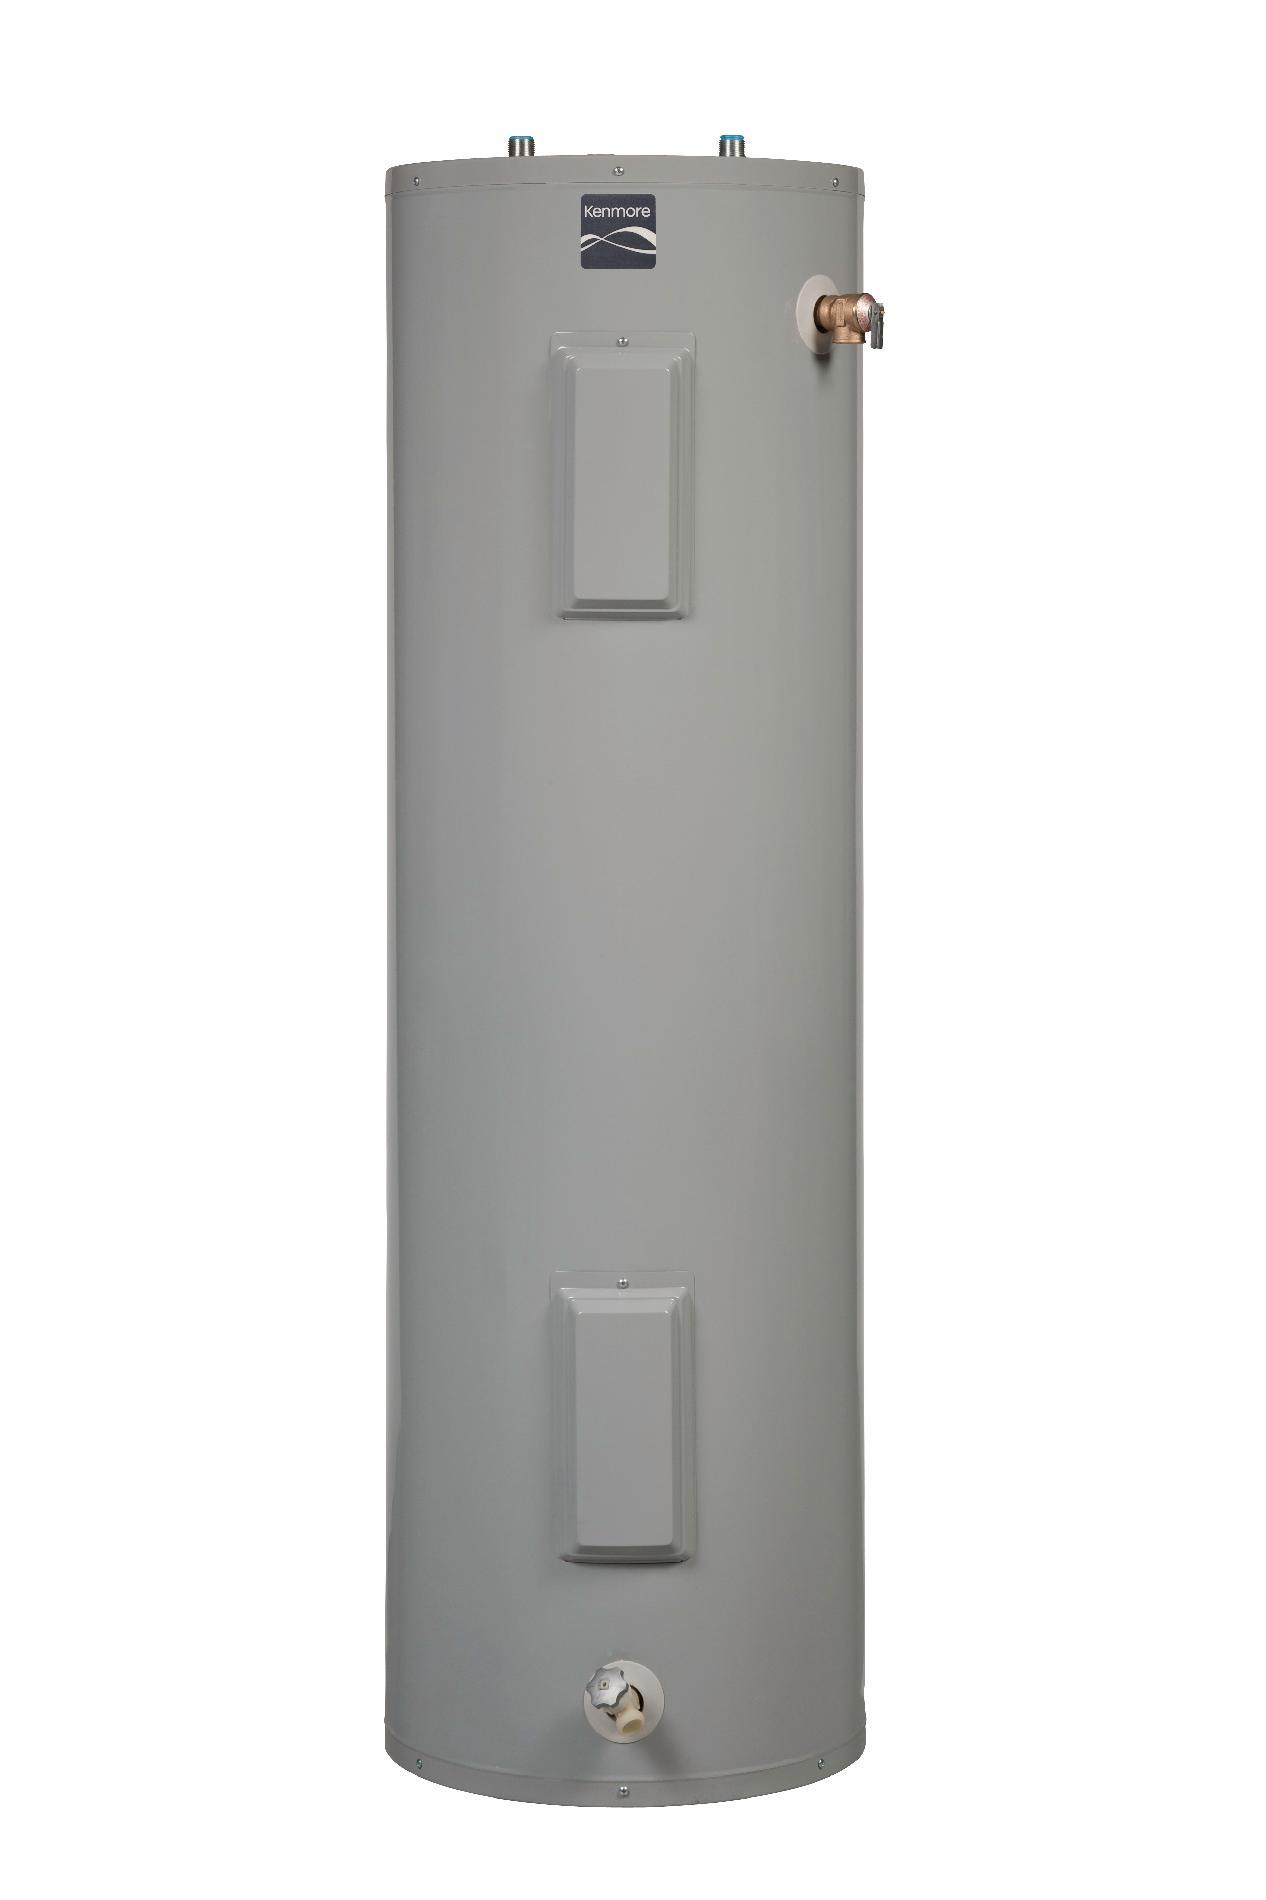 Kenmore Electric Water Heater 55 Gal. 32656